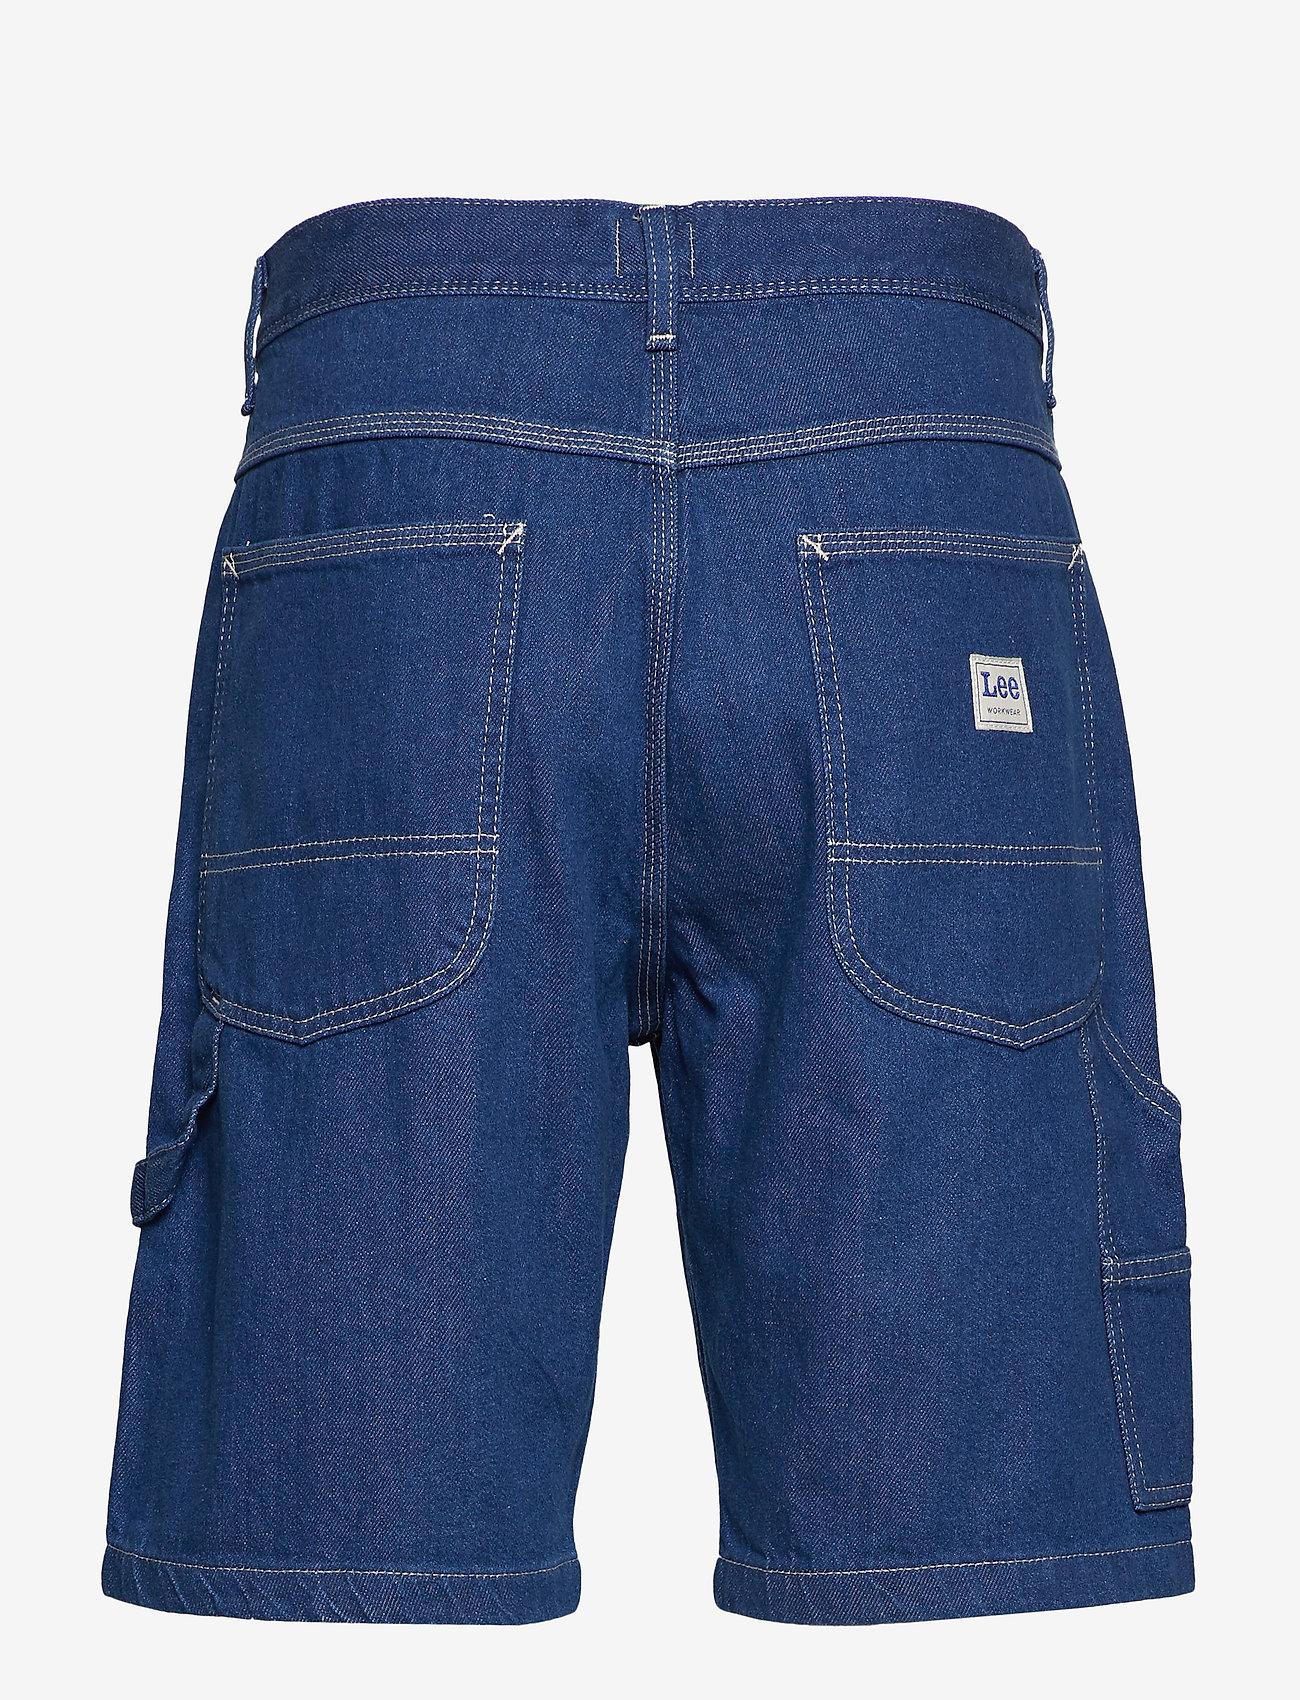 Lee Jeans - CARPENTER SHORT - denim shorts - rinse